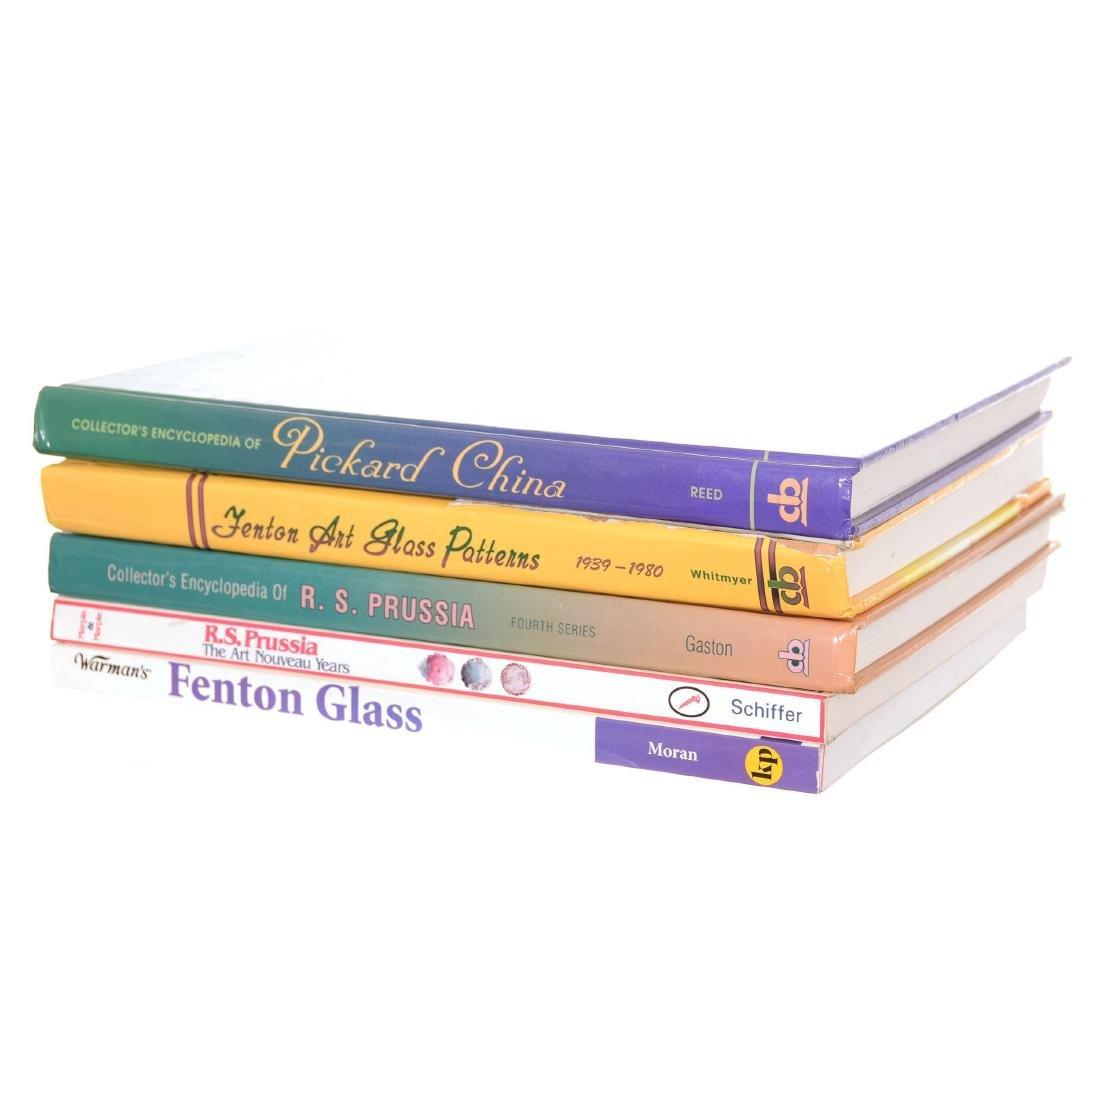 (5) Books